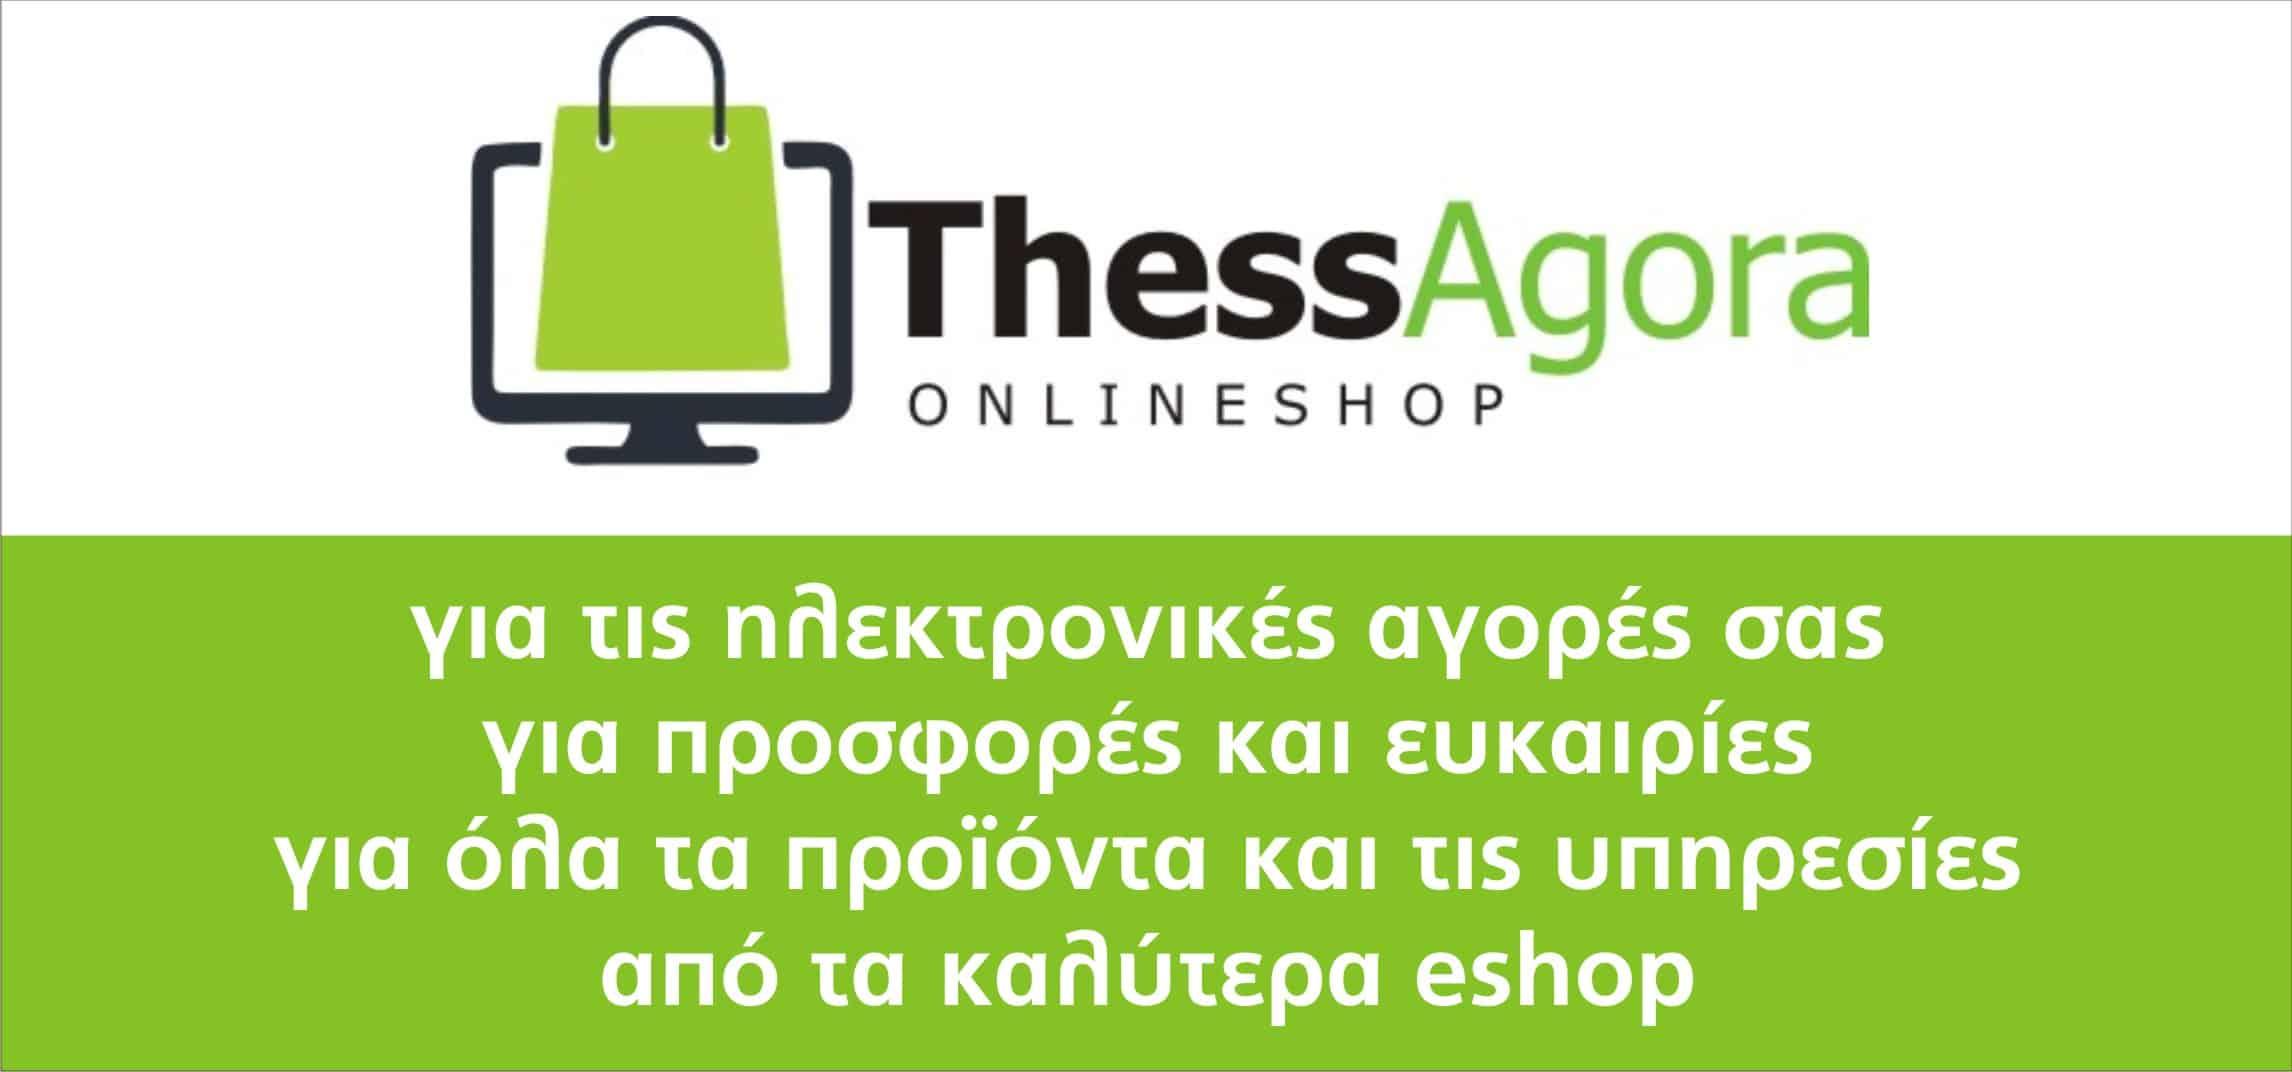 thessagora